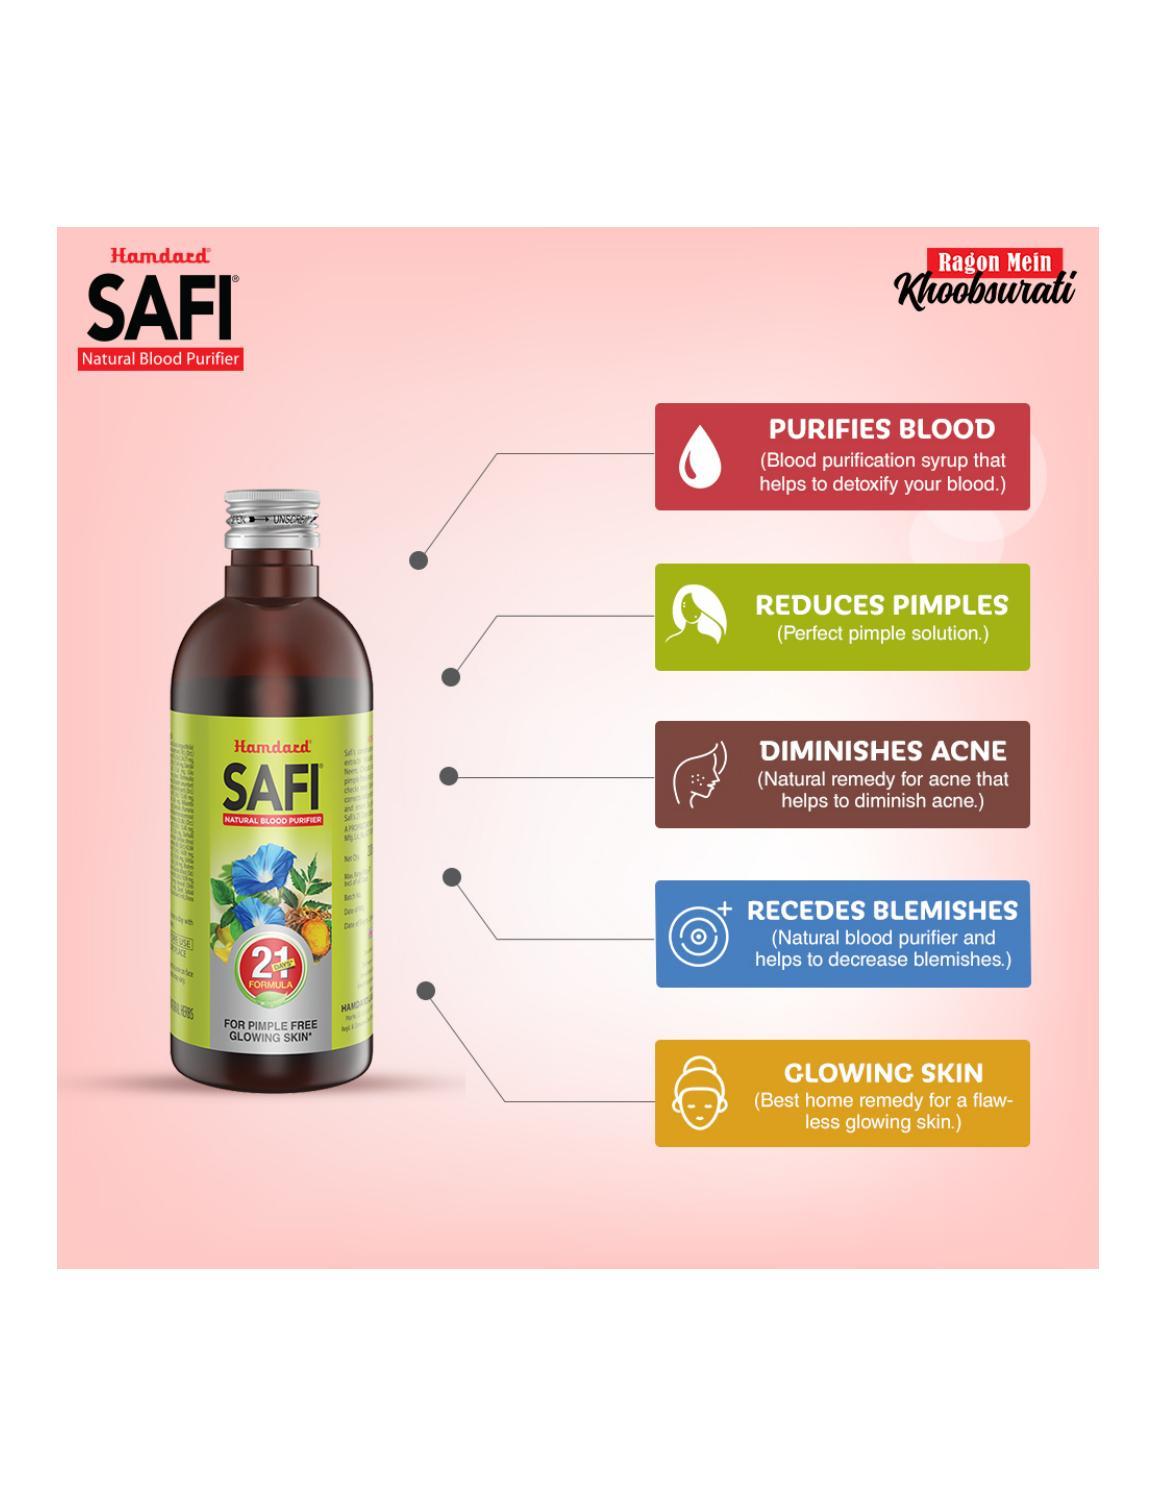 Herbal Blood Purifier For Healthy & Glowing Skin - Hamdard Safi by